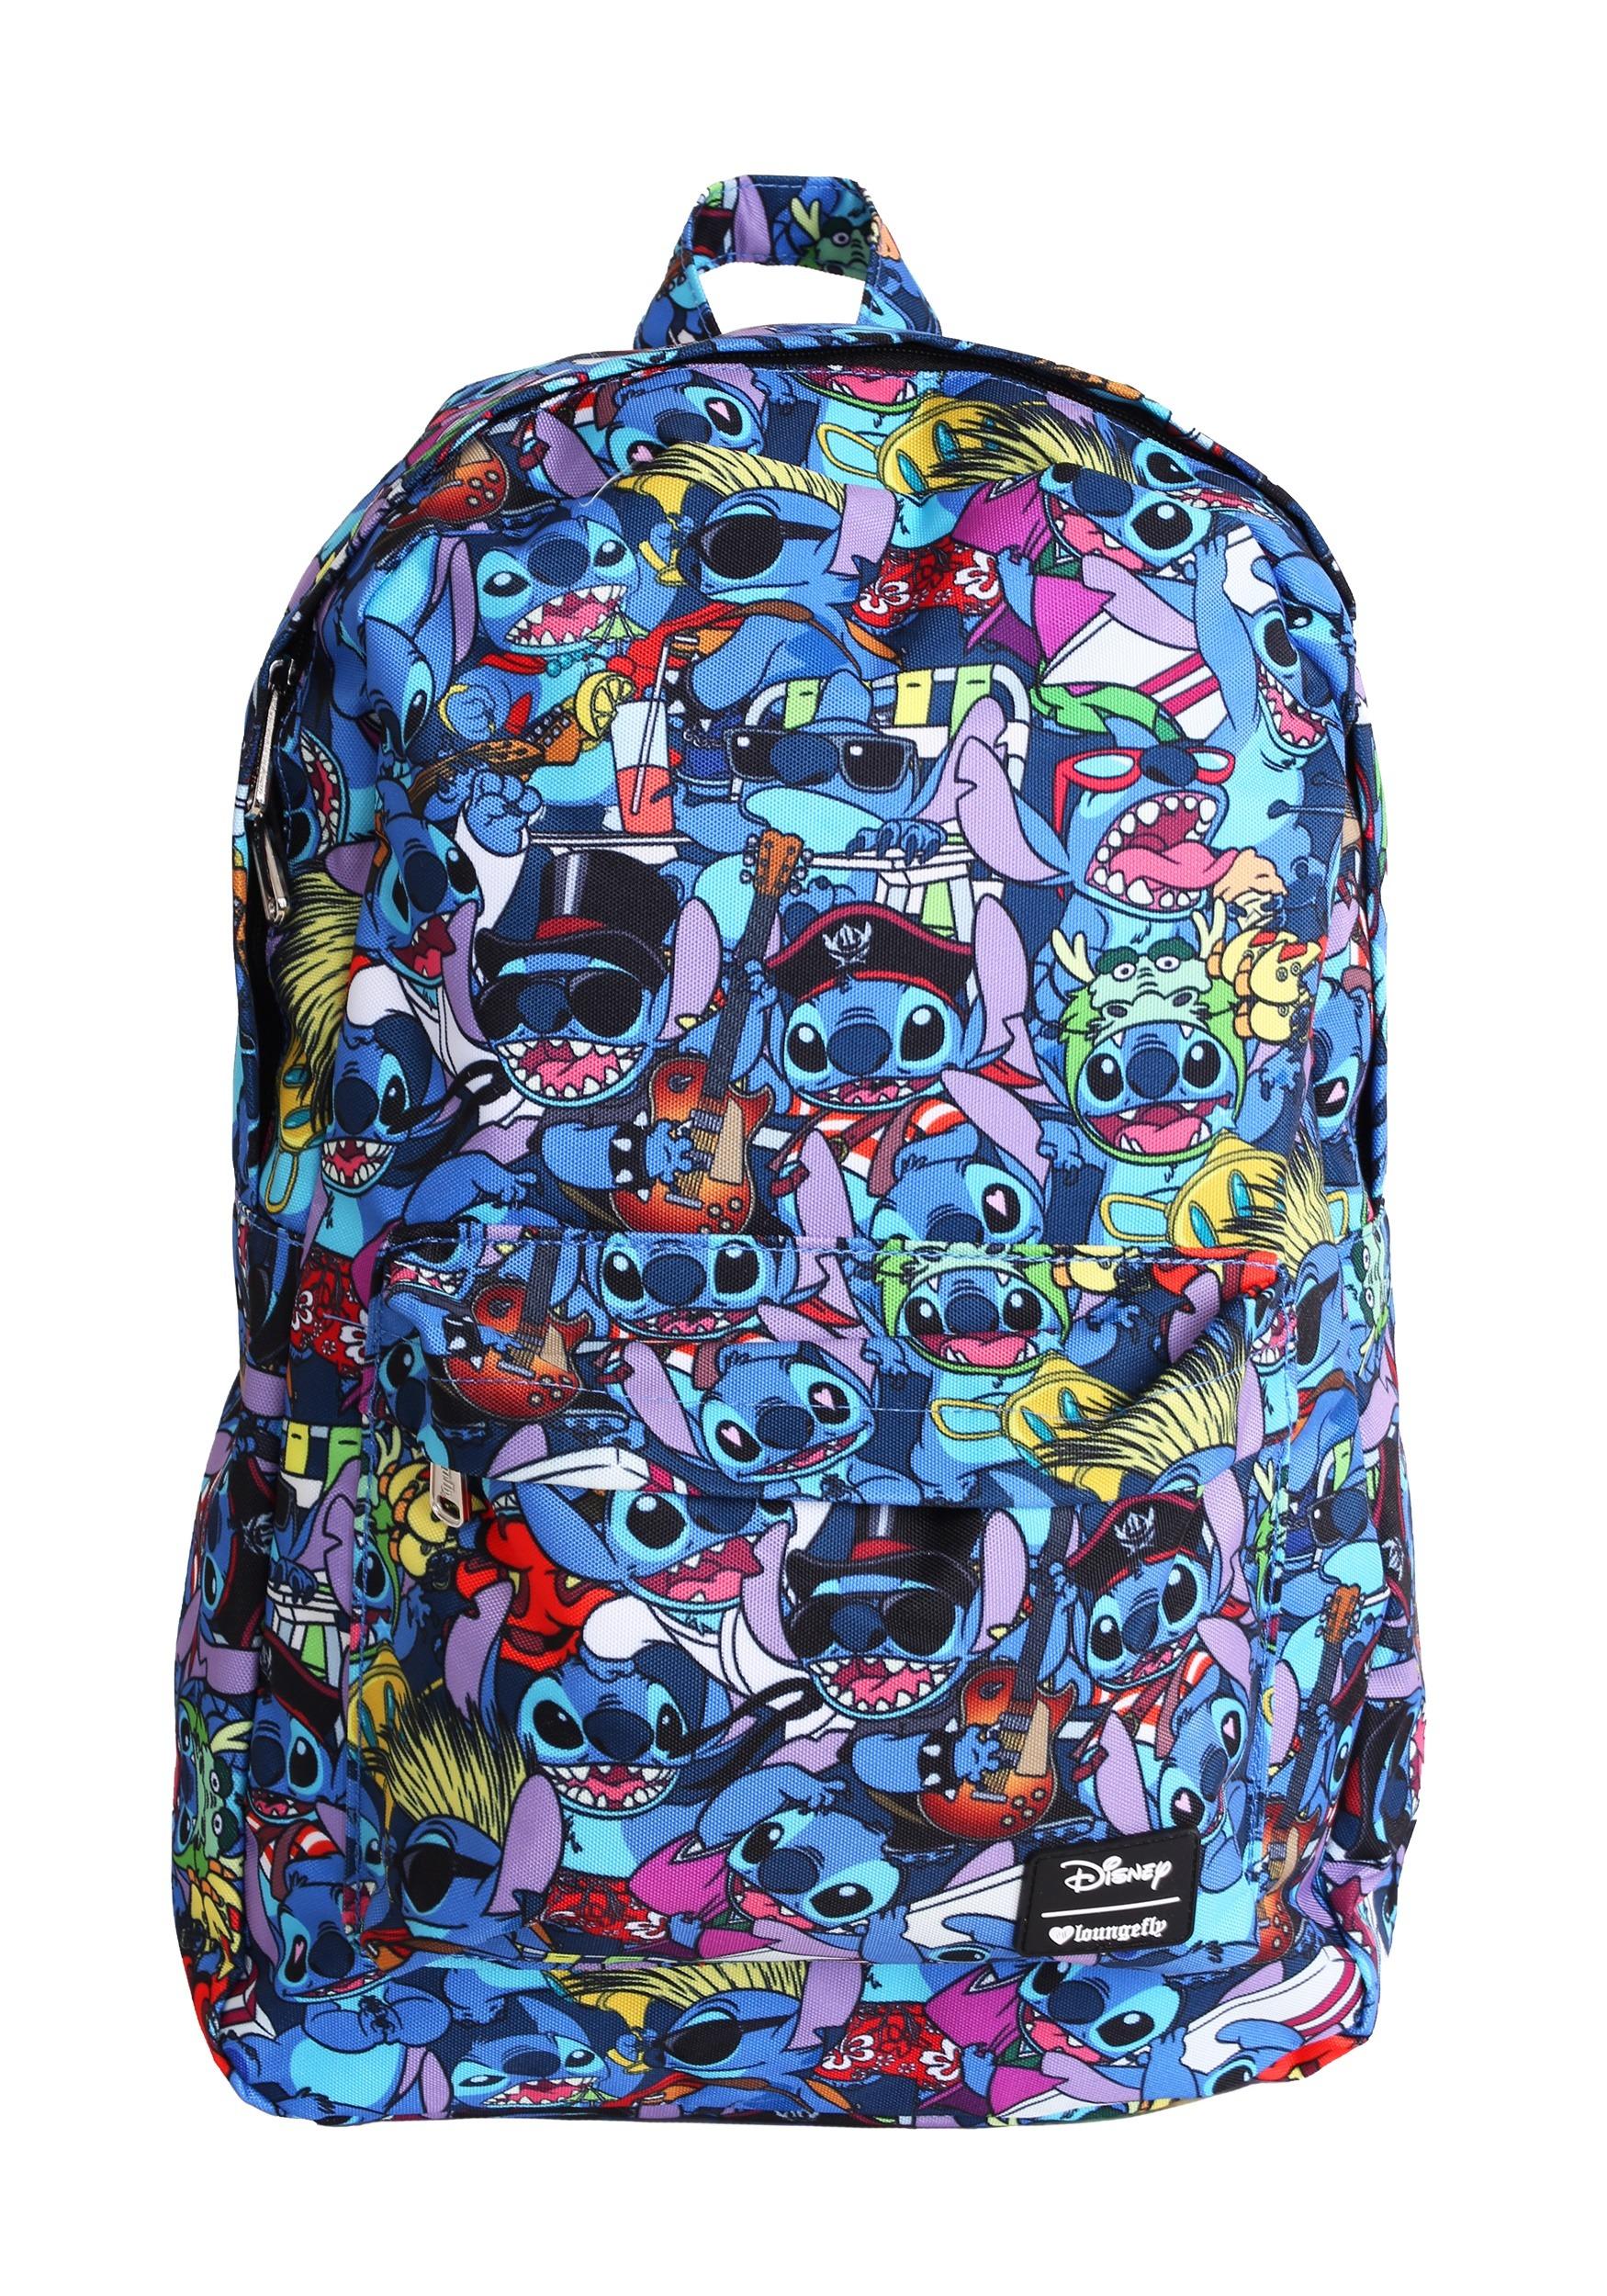 905e83a0b0e Lilo   Stitch All Over Print Loungefly Backpack